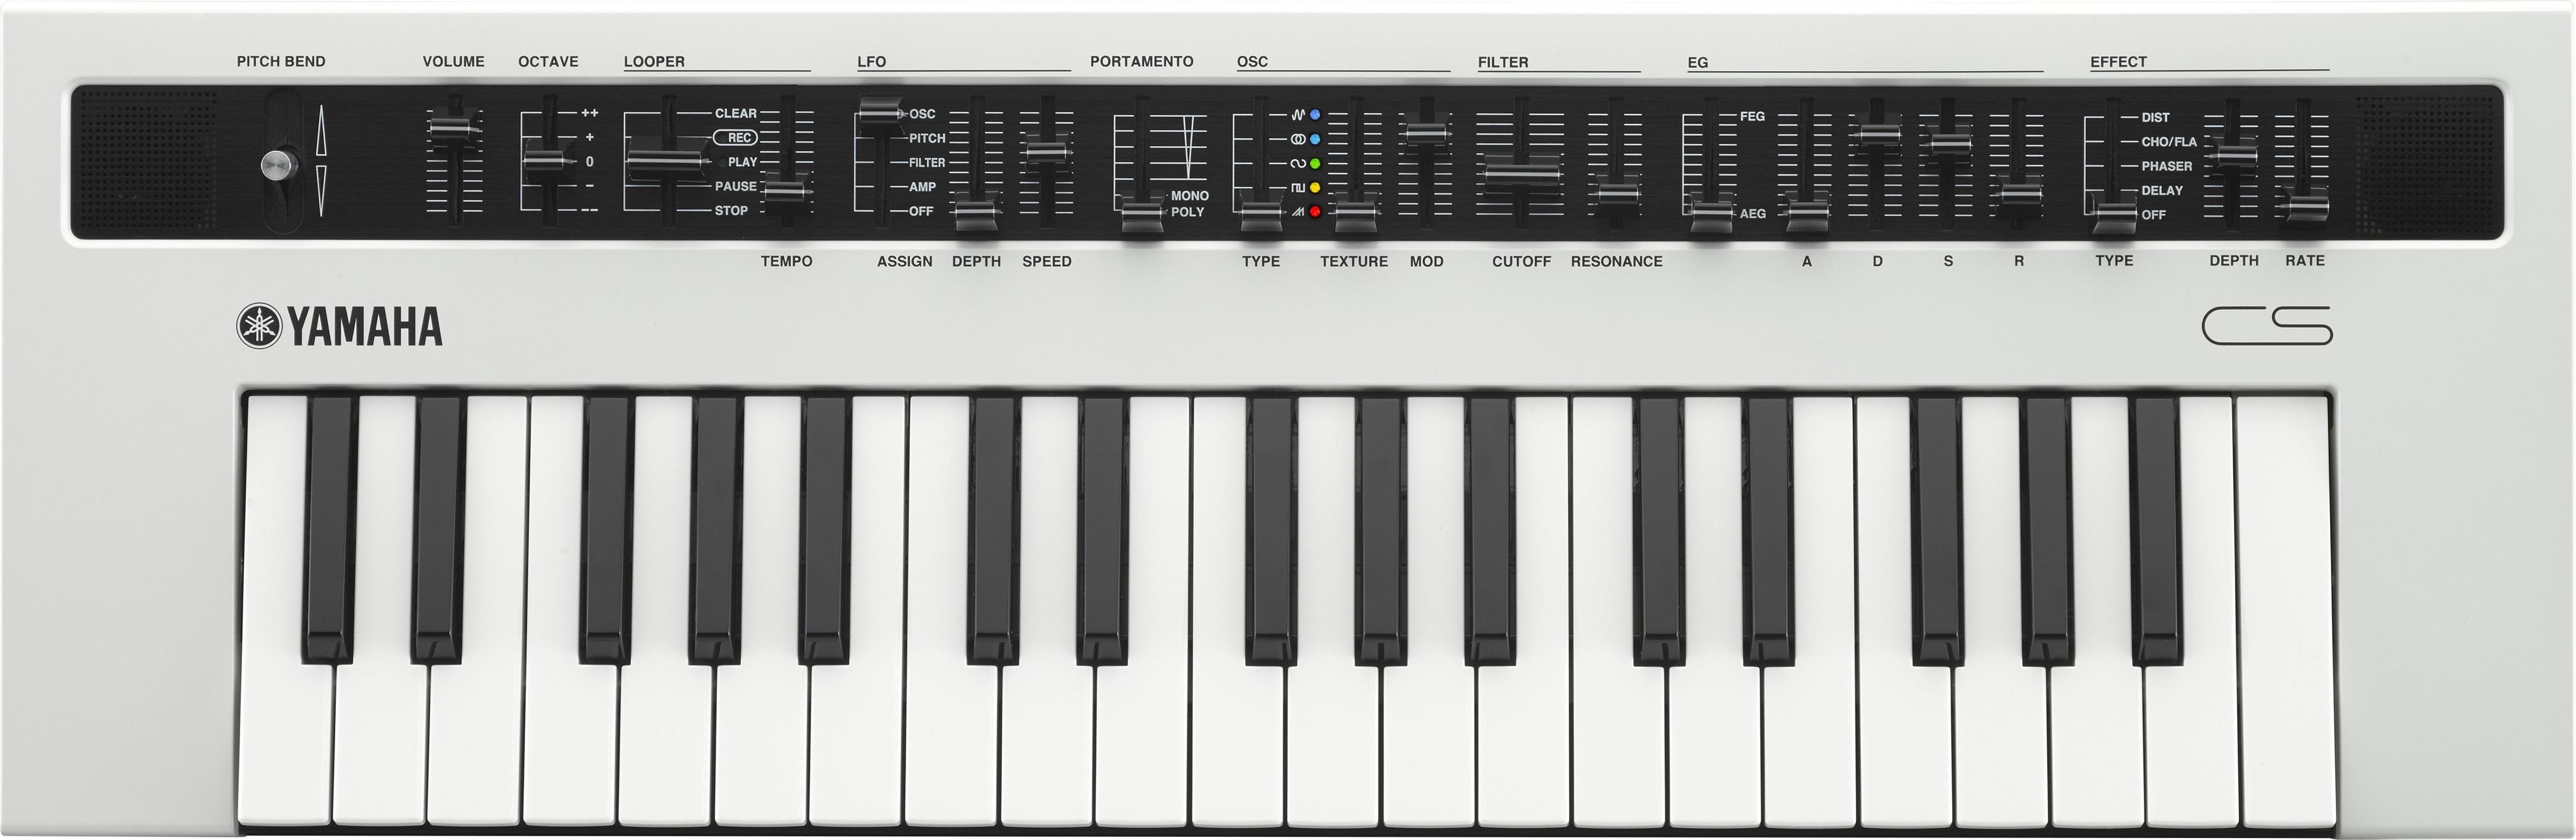 Yamaha Reface CS